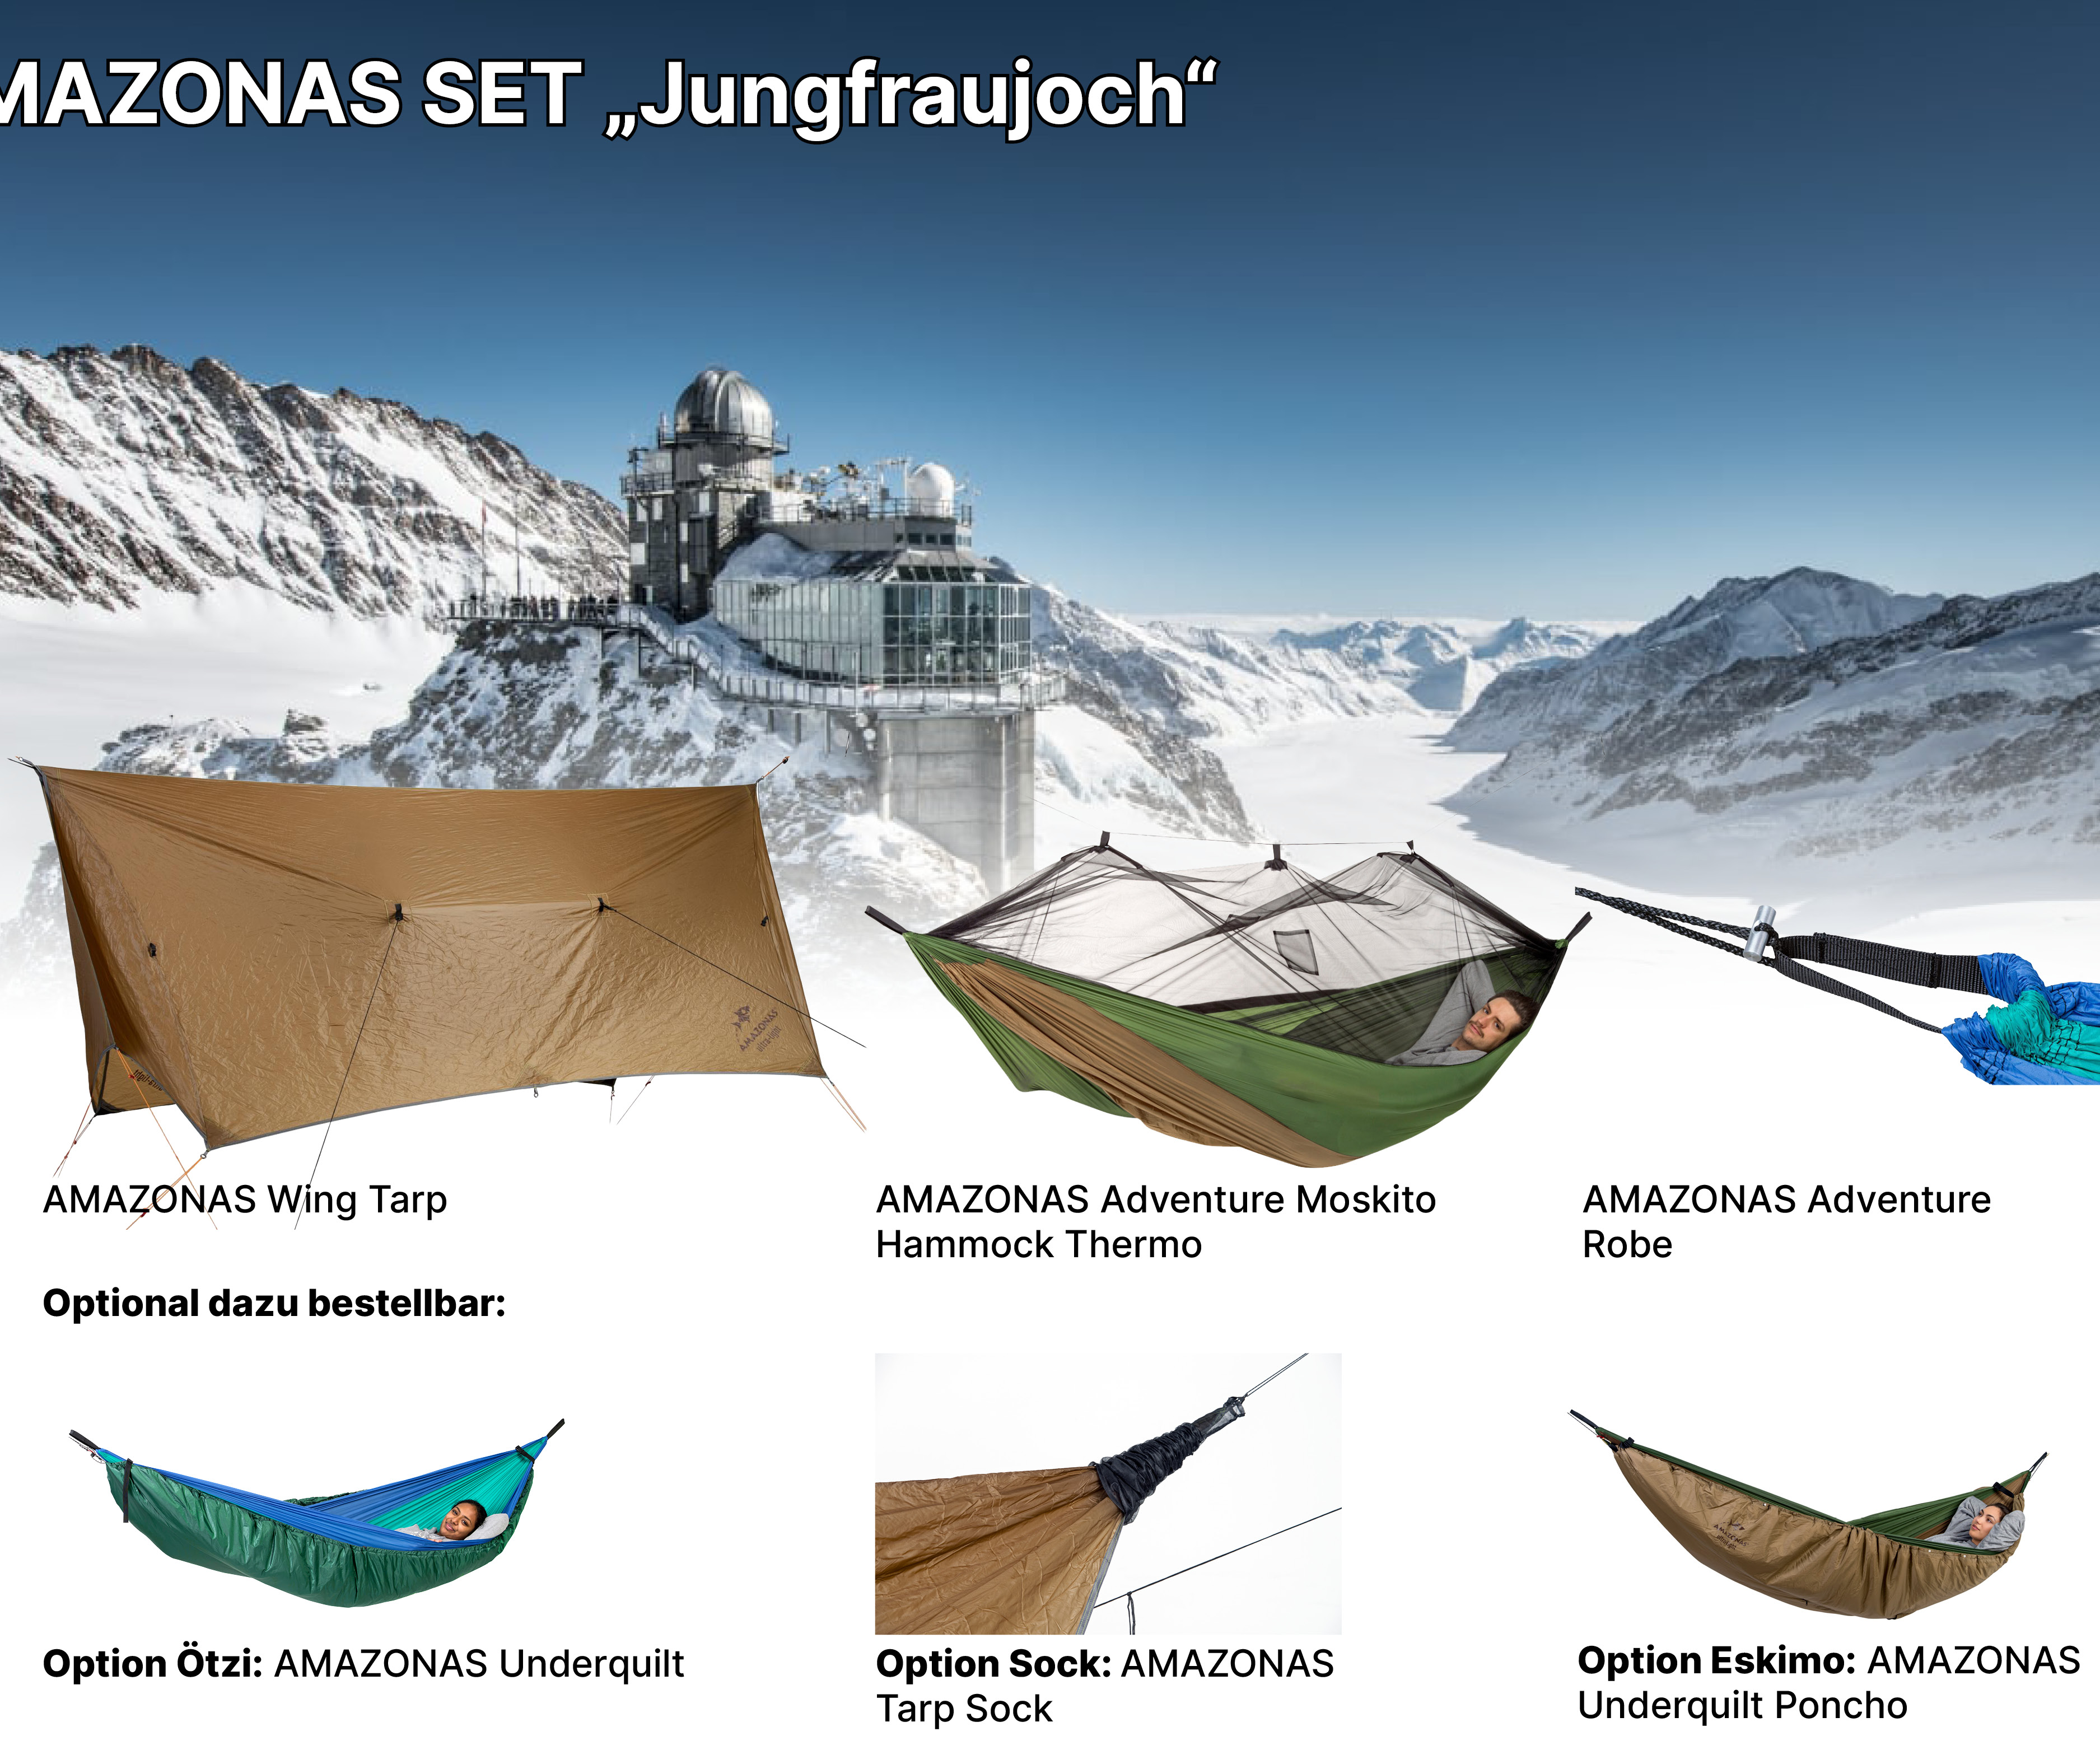 AMAZONAS Adventure Set Jungfraujoch AMAZONAS Poncho zum Sonderpreis AMAZONAS Sock zum Sonderpreis